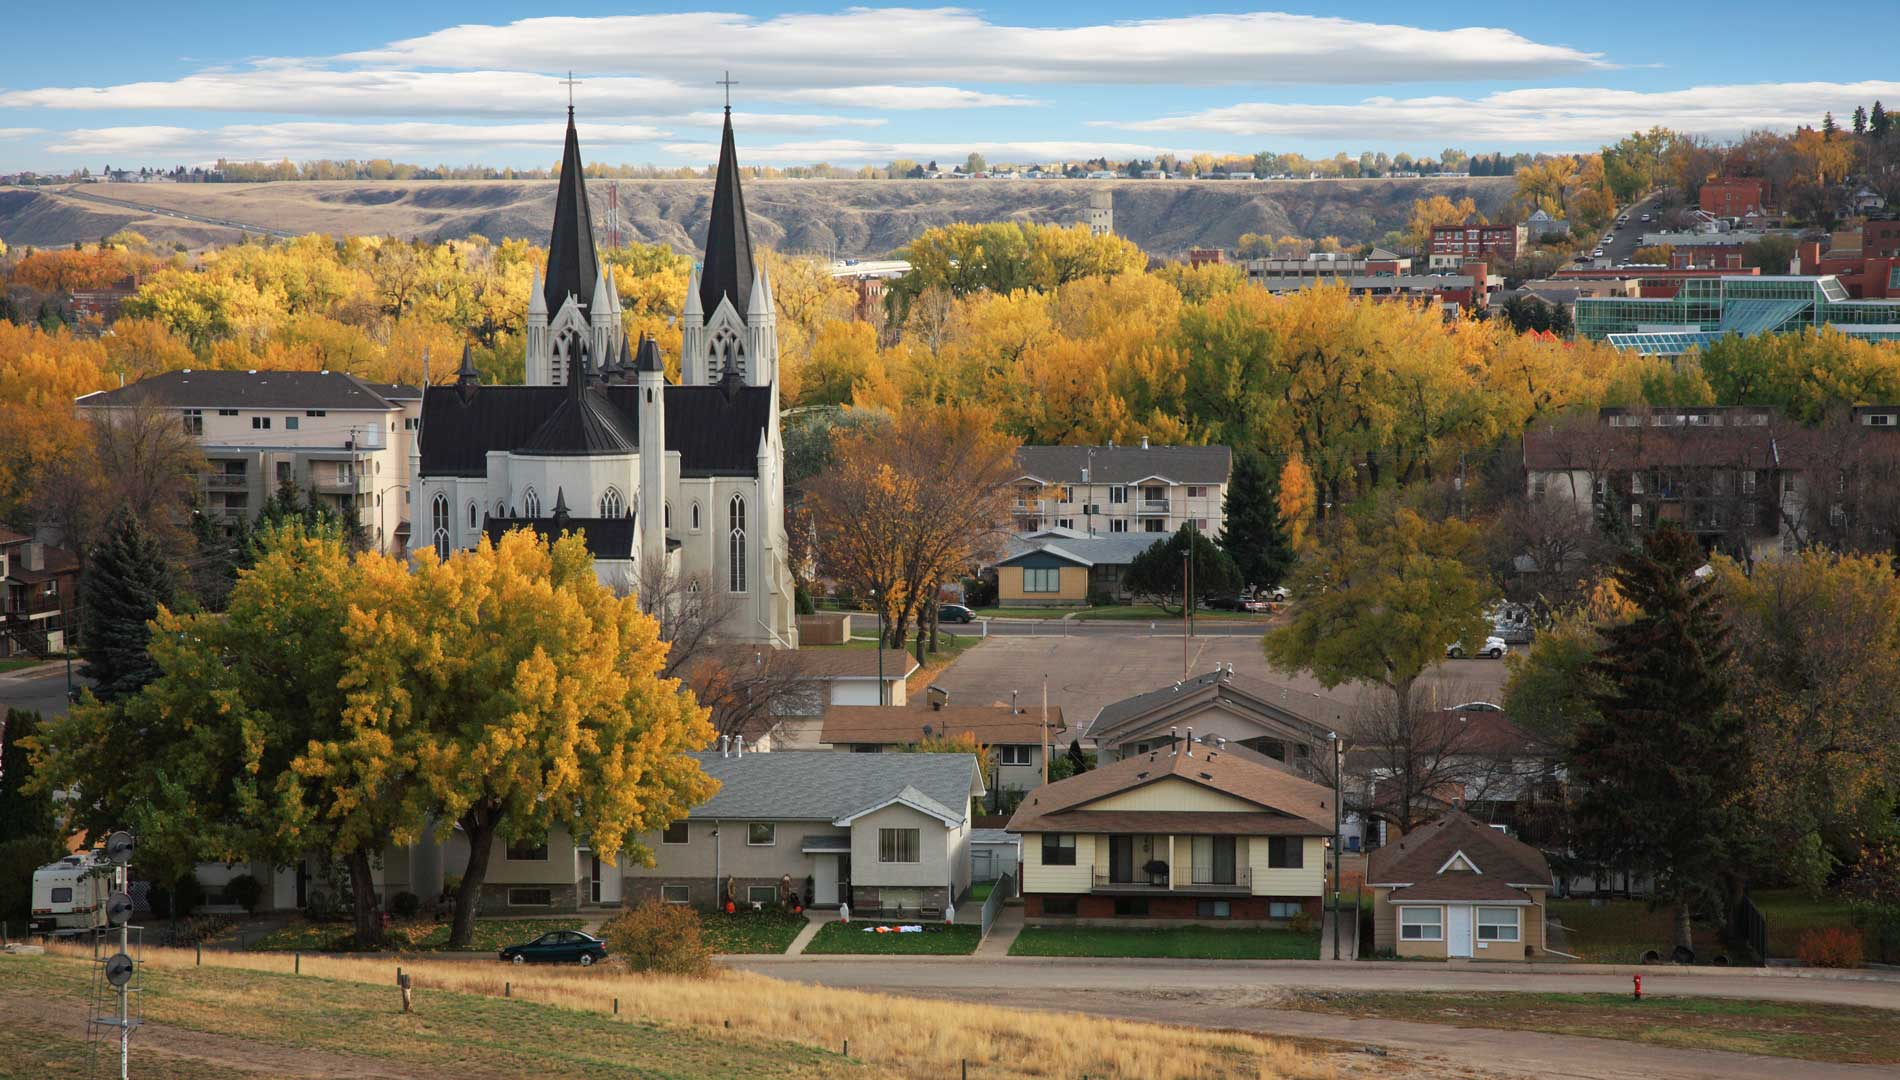 town photo of Medicine Hat in Alberta